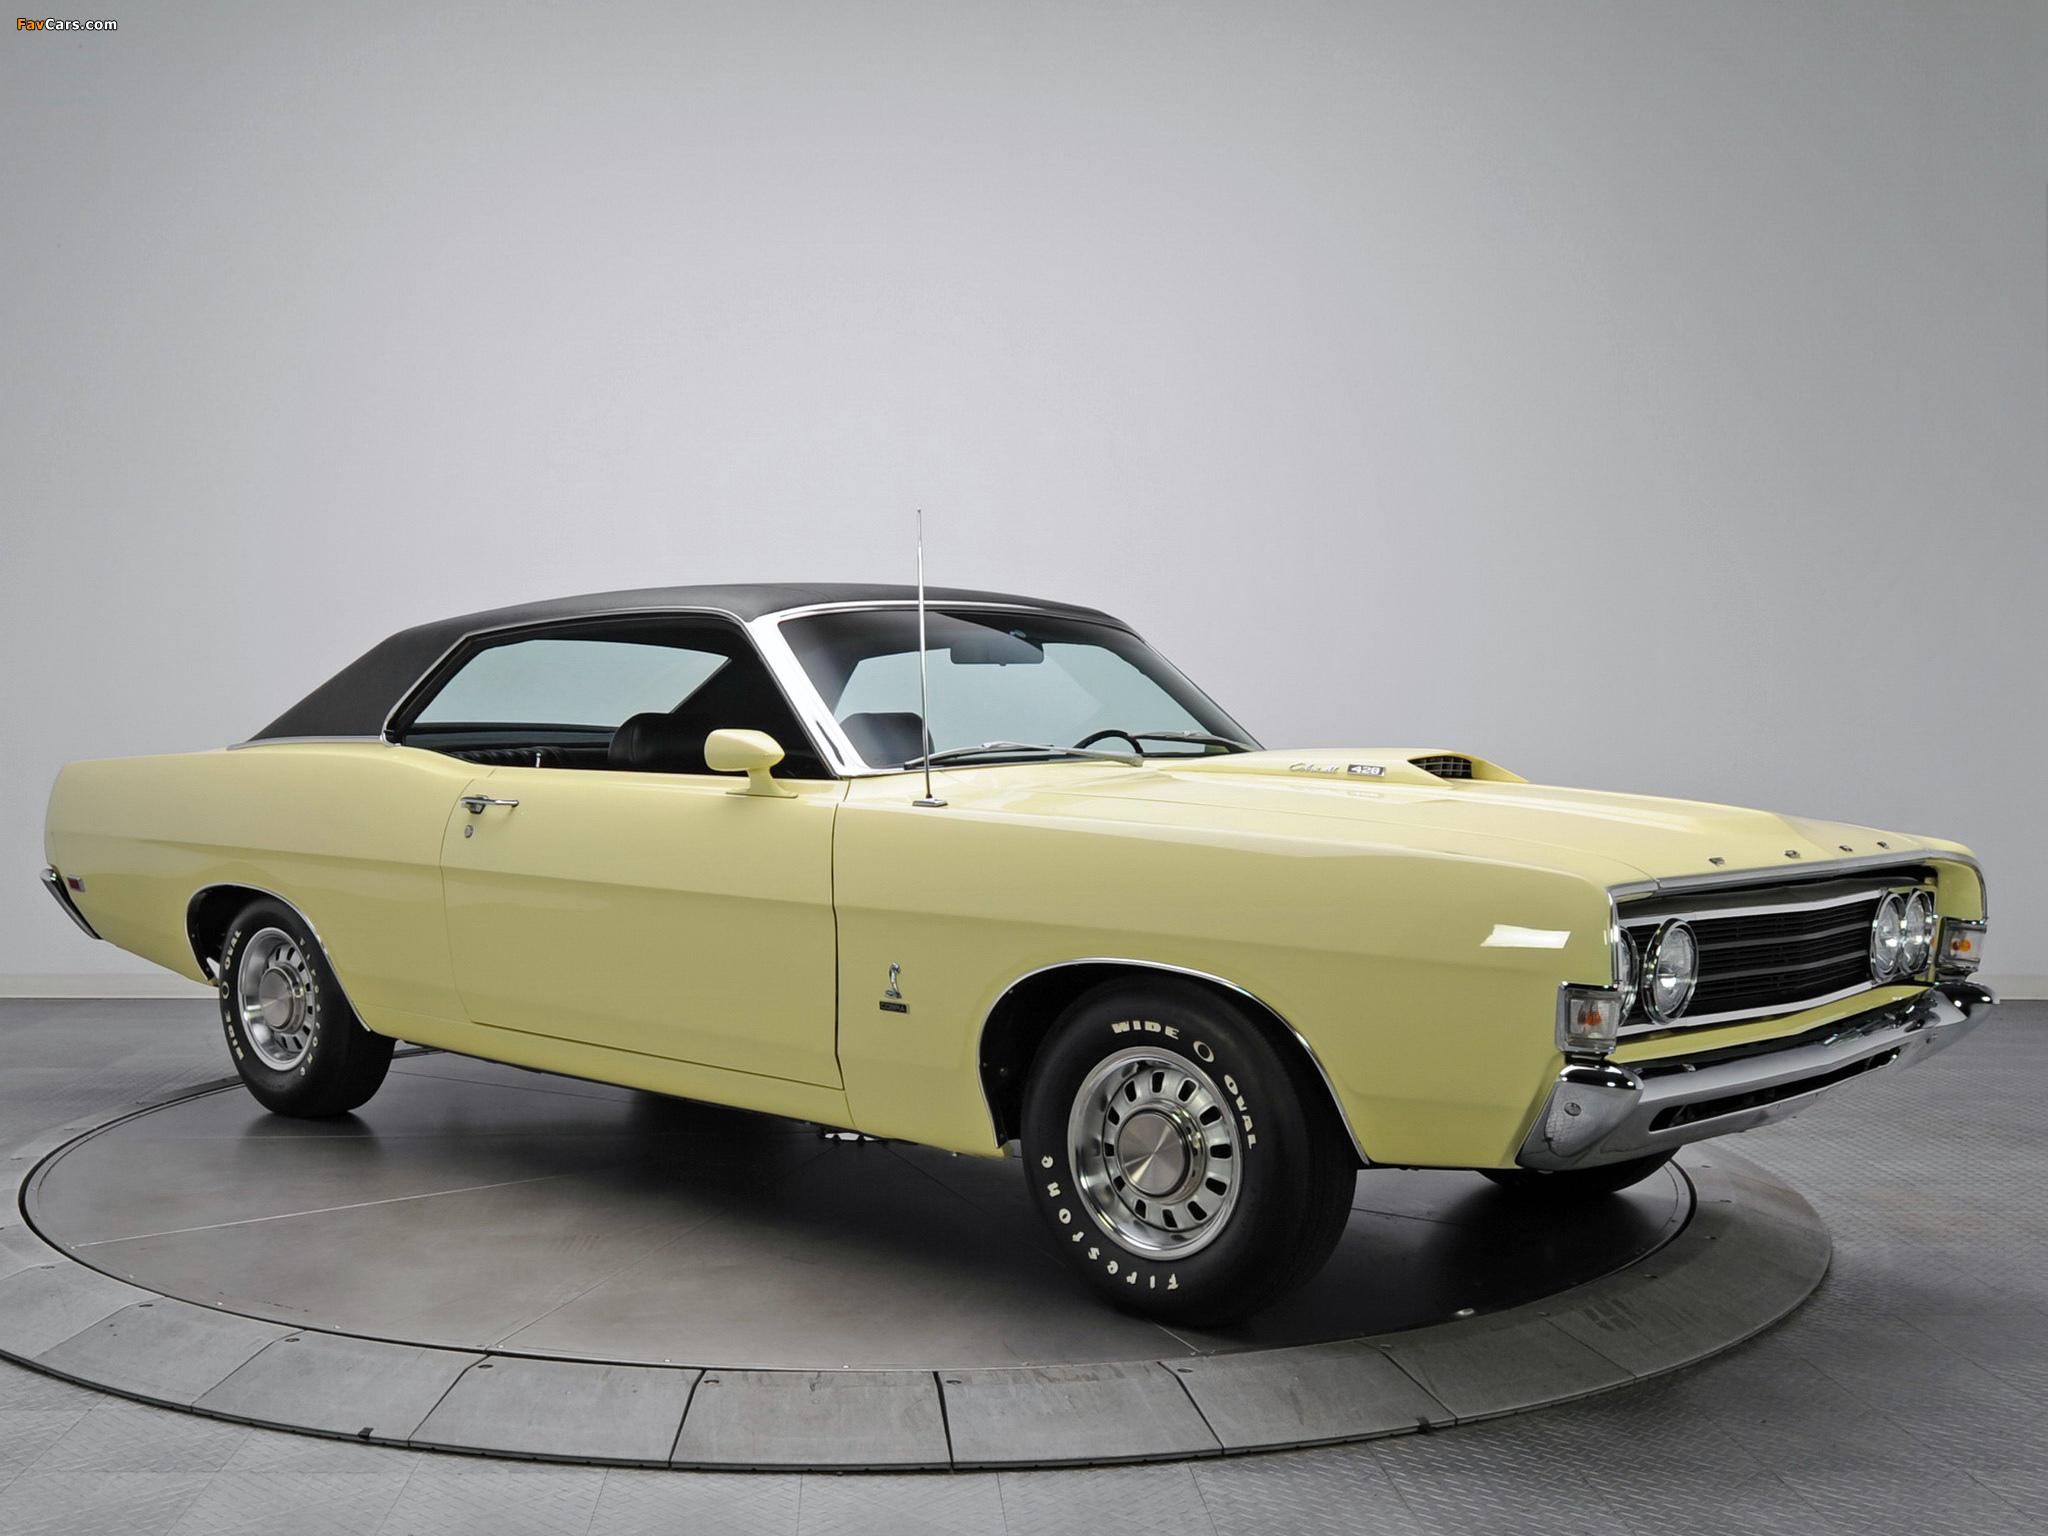 Ford Fairlane Torino Cobra 428 Cj 45 1969 Wallpapers 2048x1536 Muscle Cars 2048 X 1536